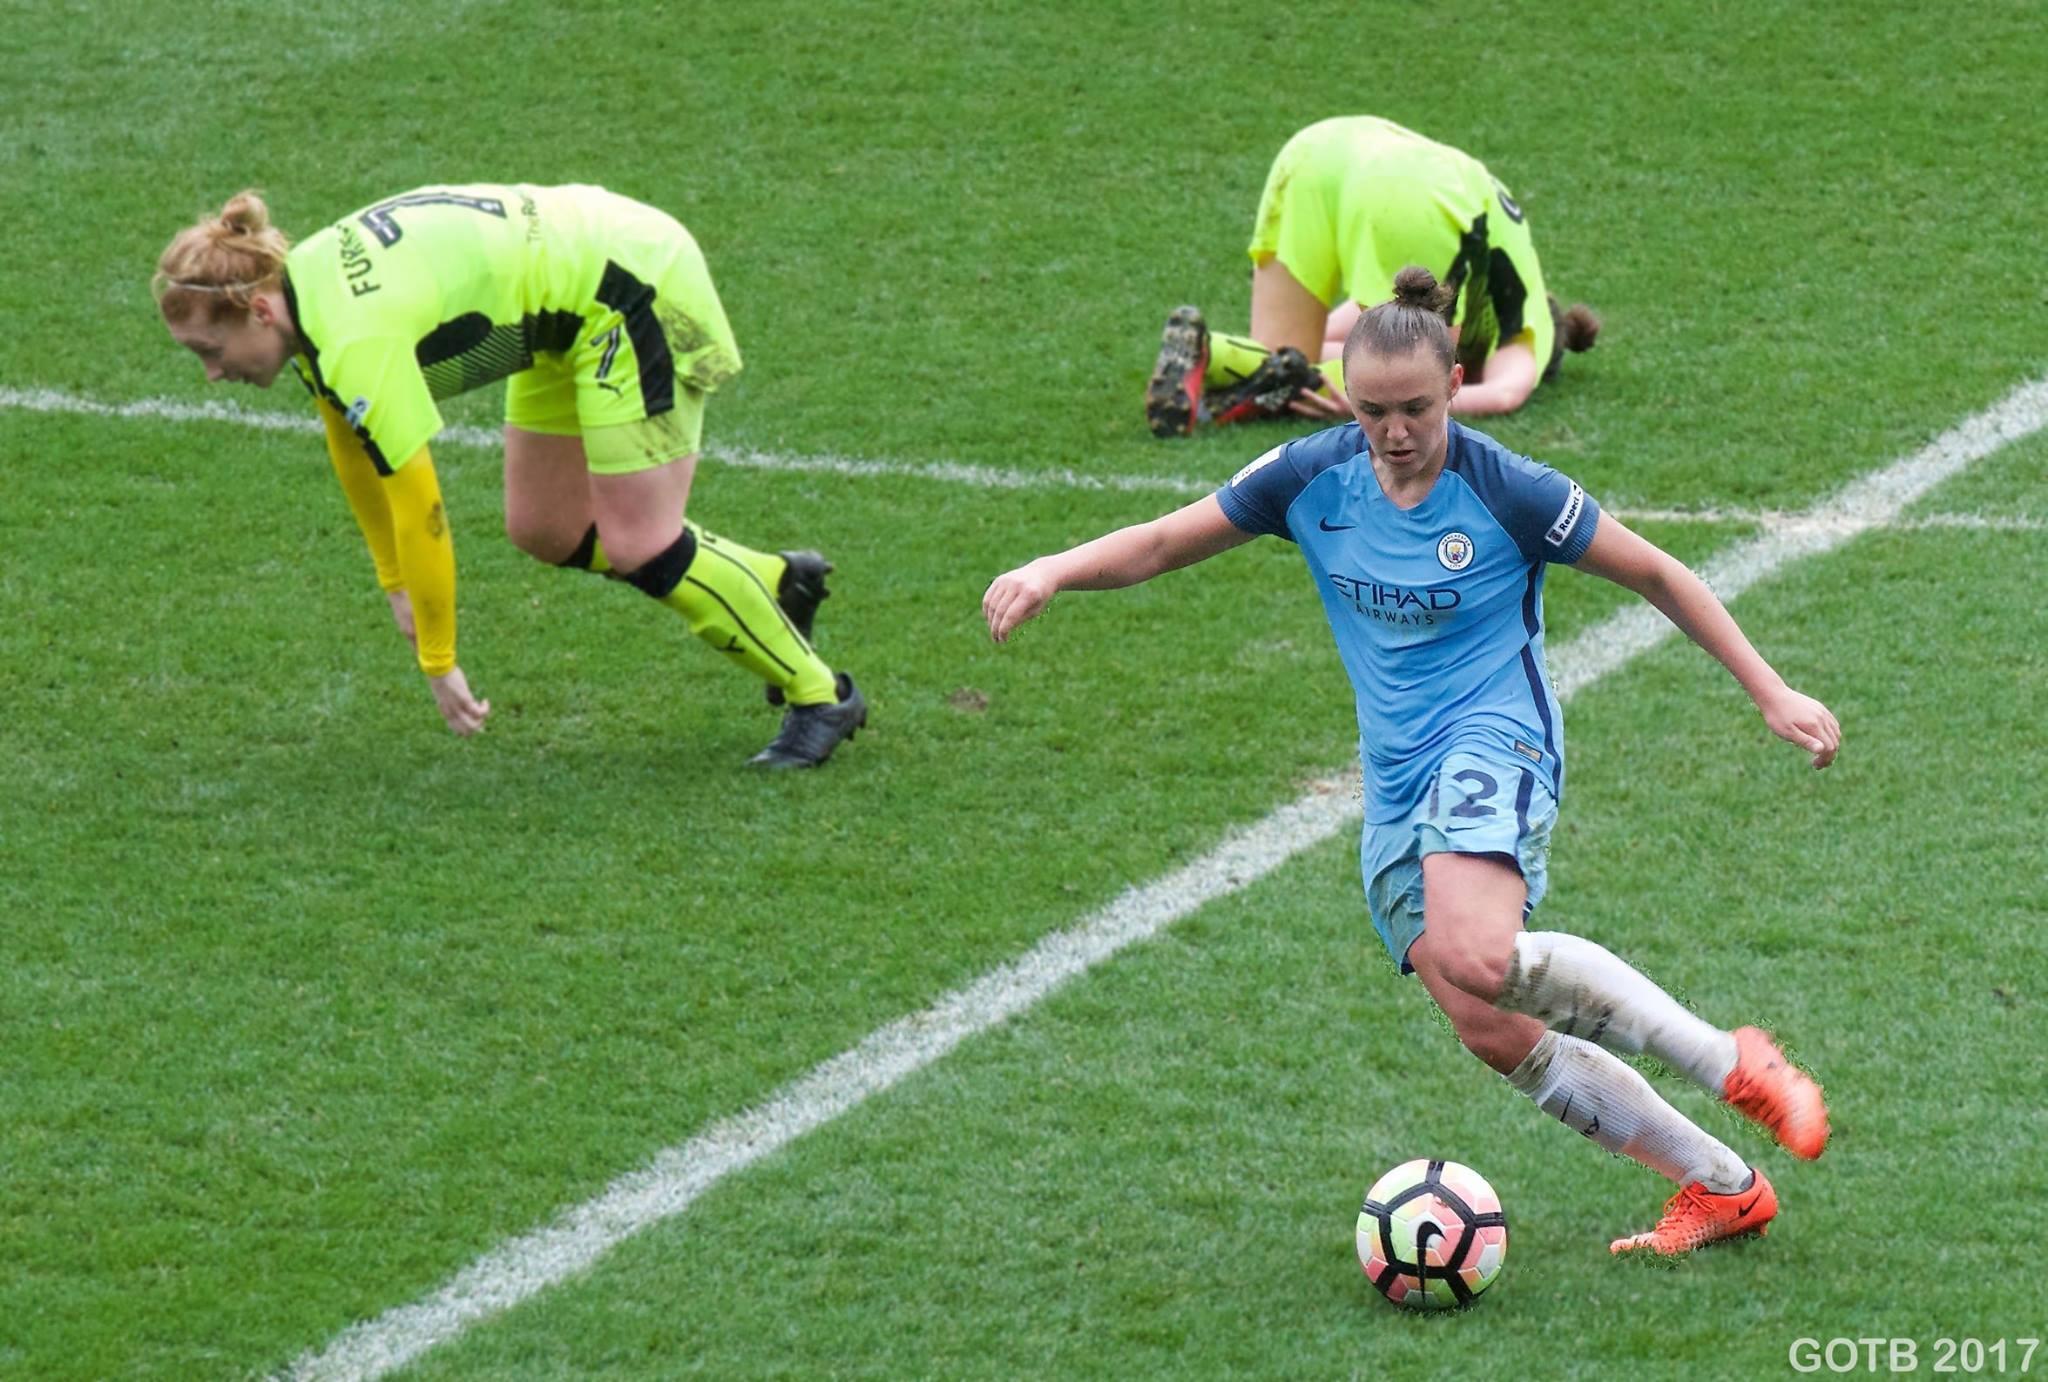 Manchester City v Reading, FAWSL 1